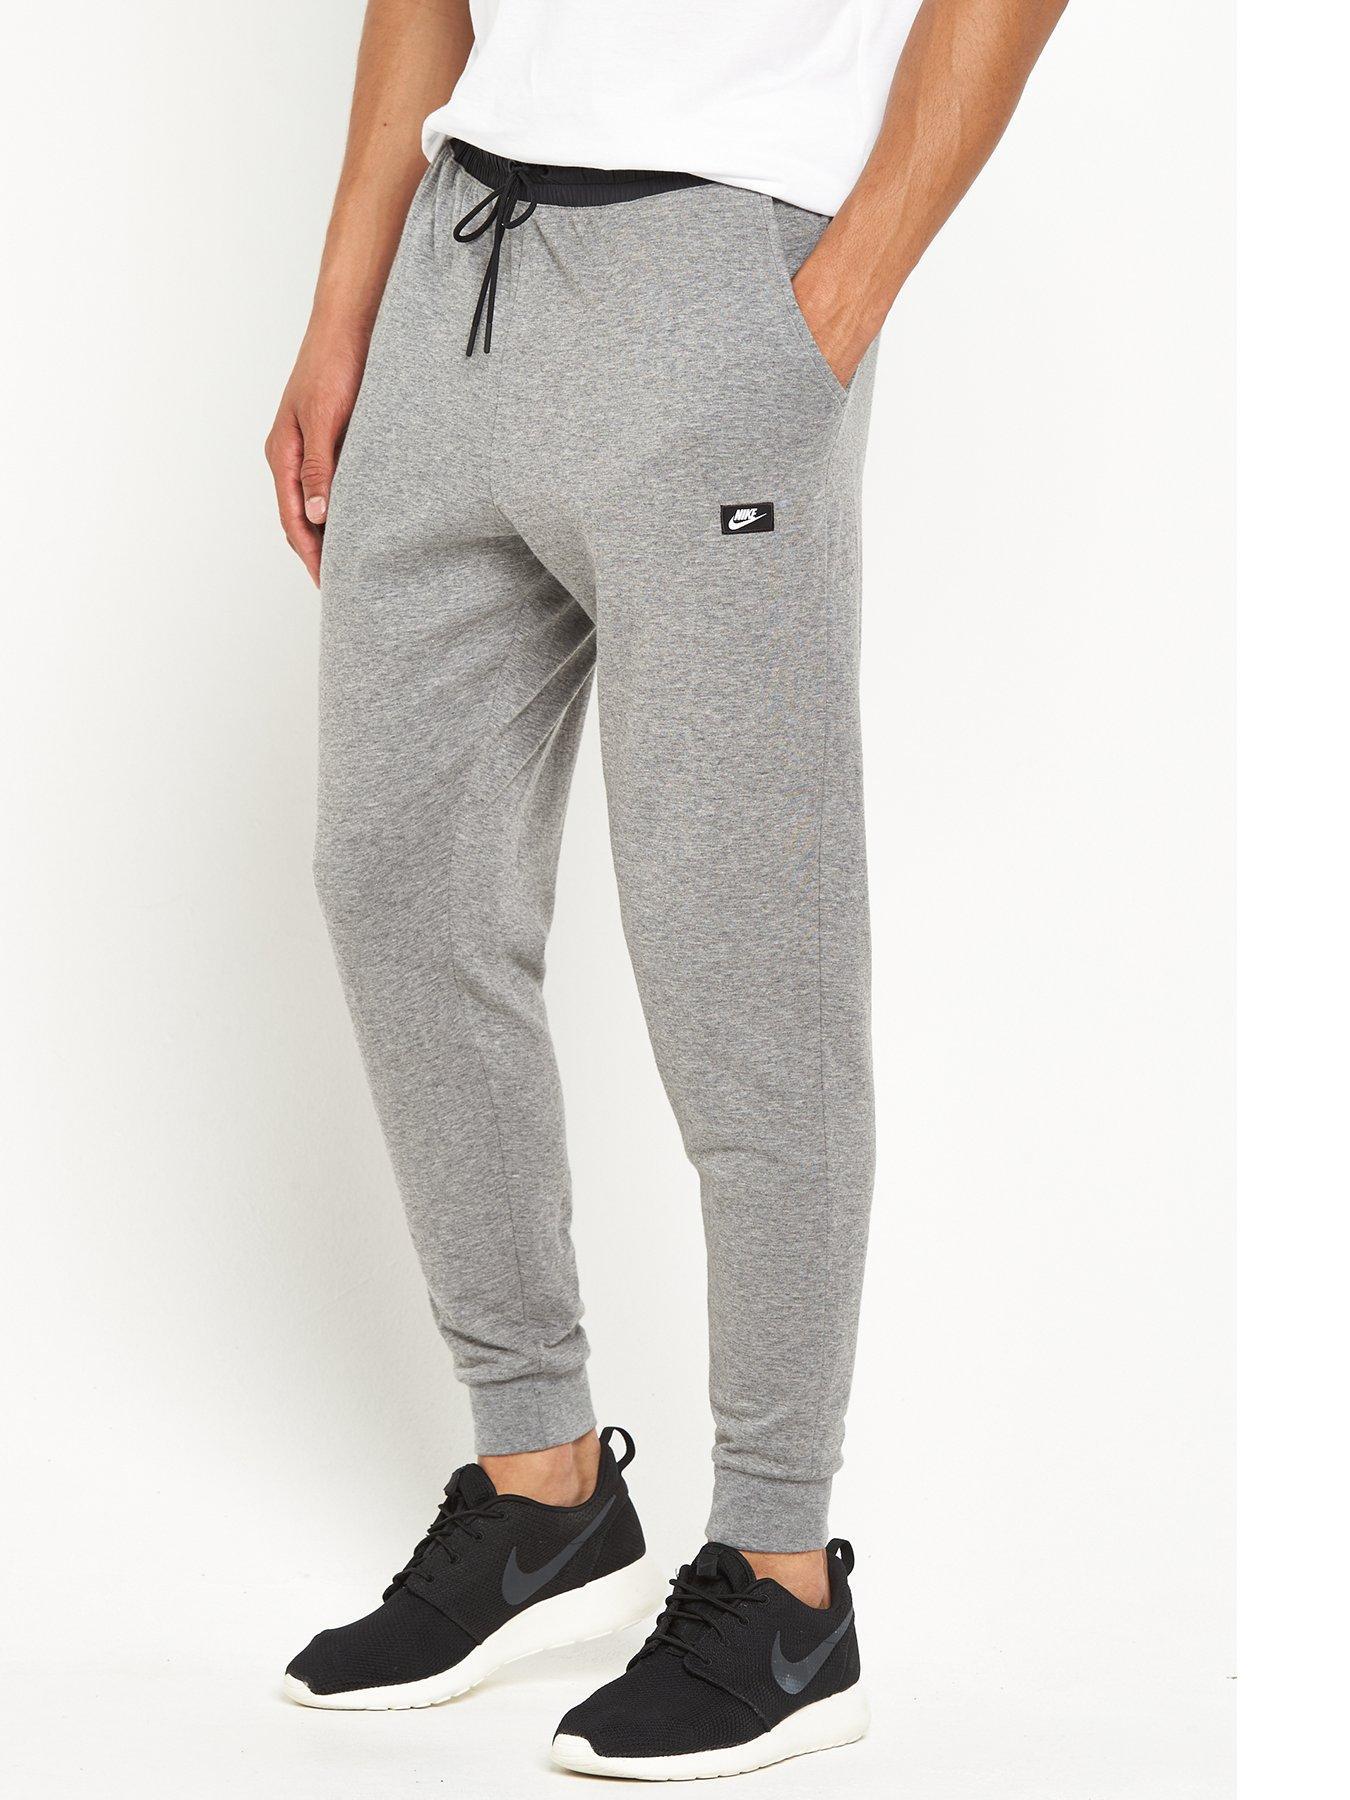 joggers nike nike sportswear modern joggers